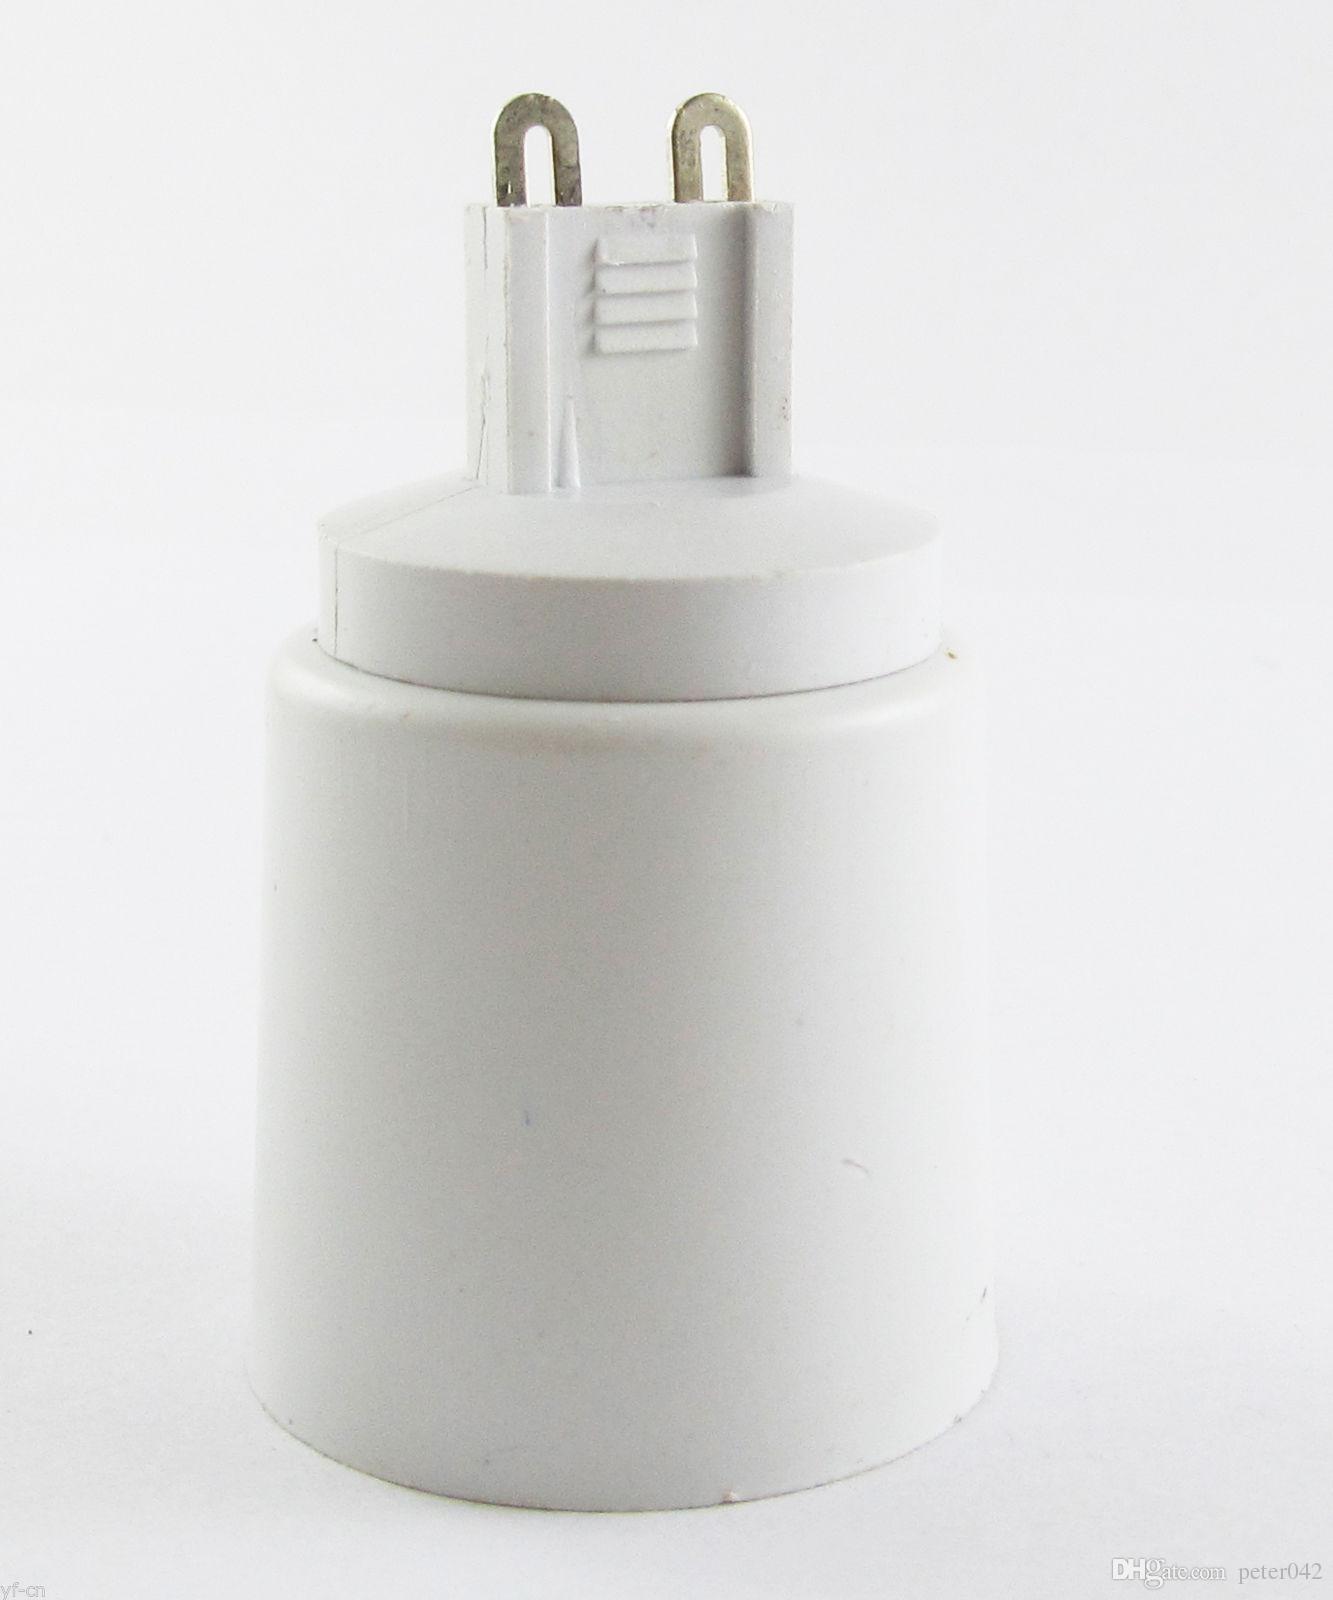 G9 ذكر إلى E27 أنثى المقبس قاعدة الصمام الهالوجين CFL ضوء لمبة مصباح محول